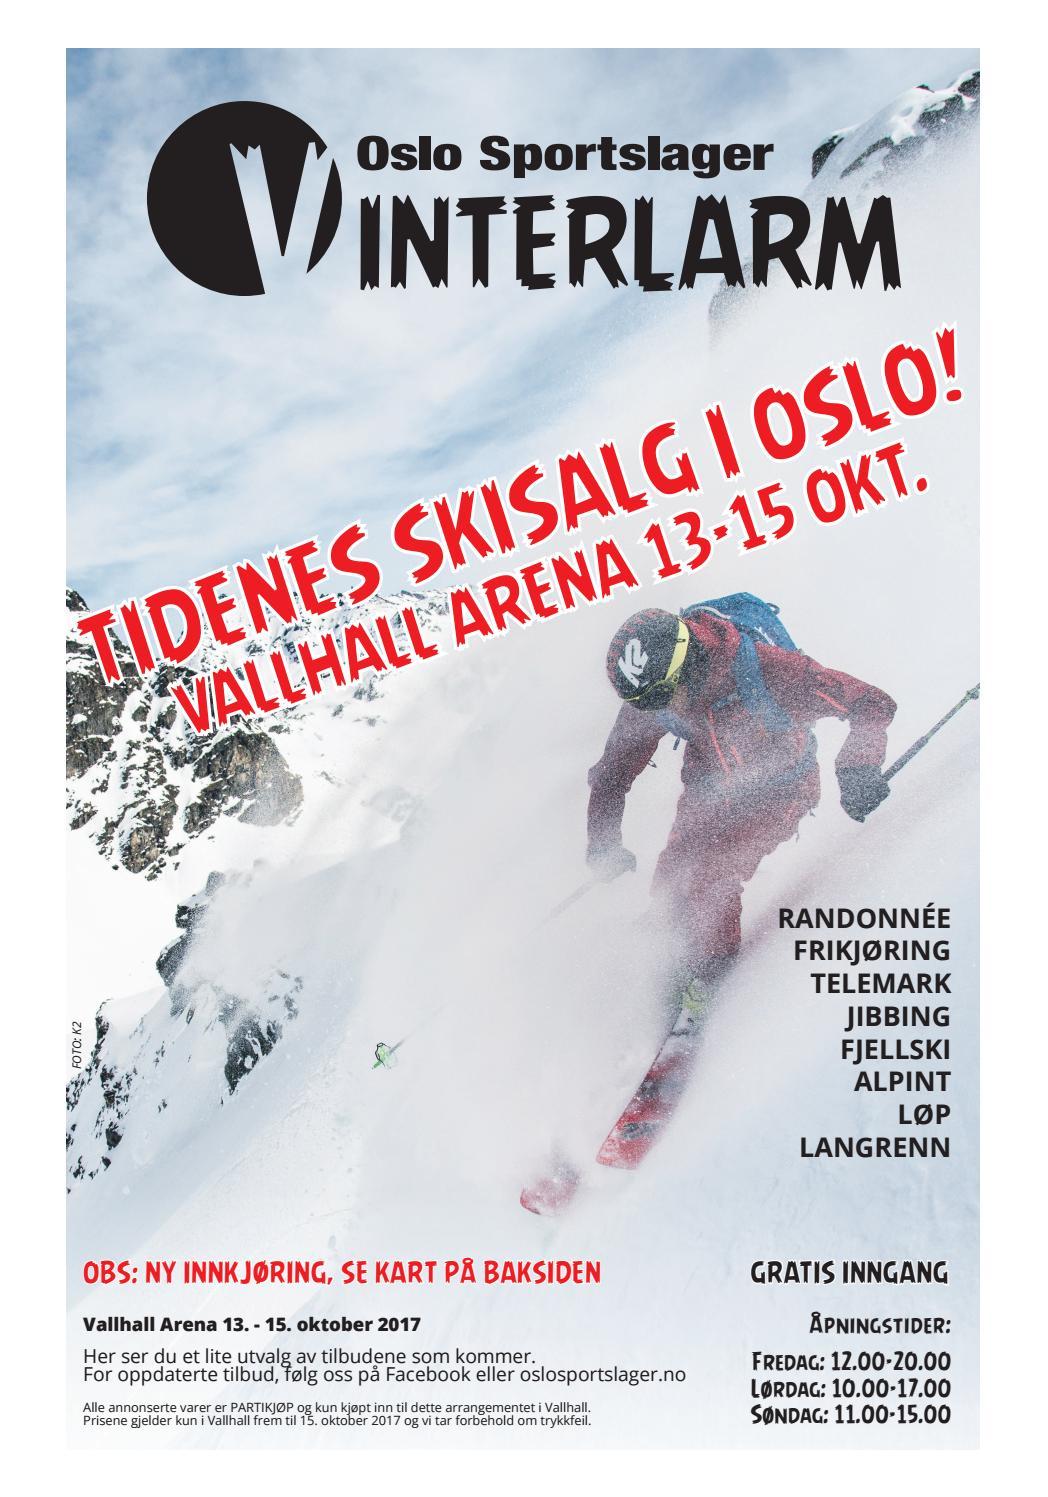 57cbf0a7 Oslo Sportslager Vinterlarm 2017 by Oslo Sportslager - issuu